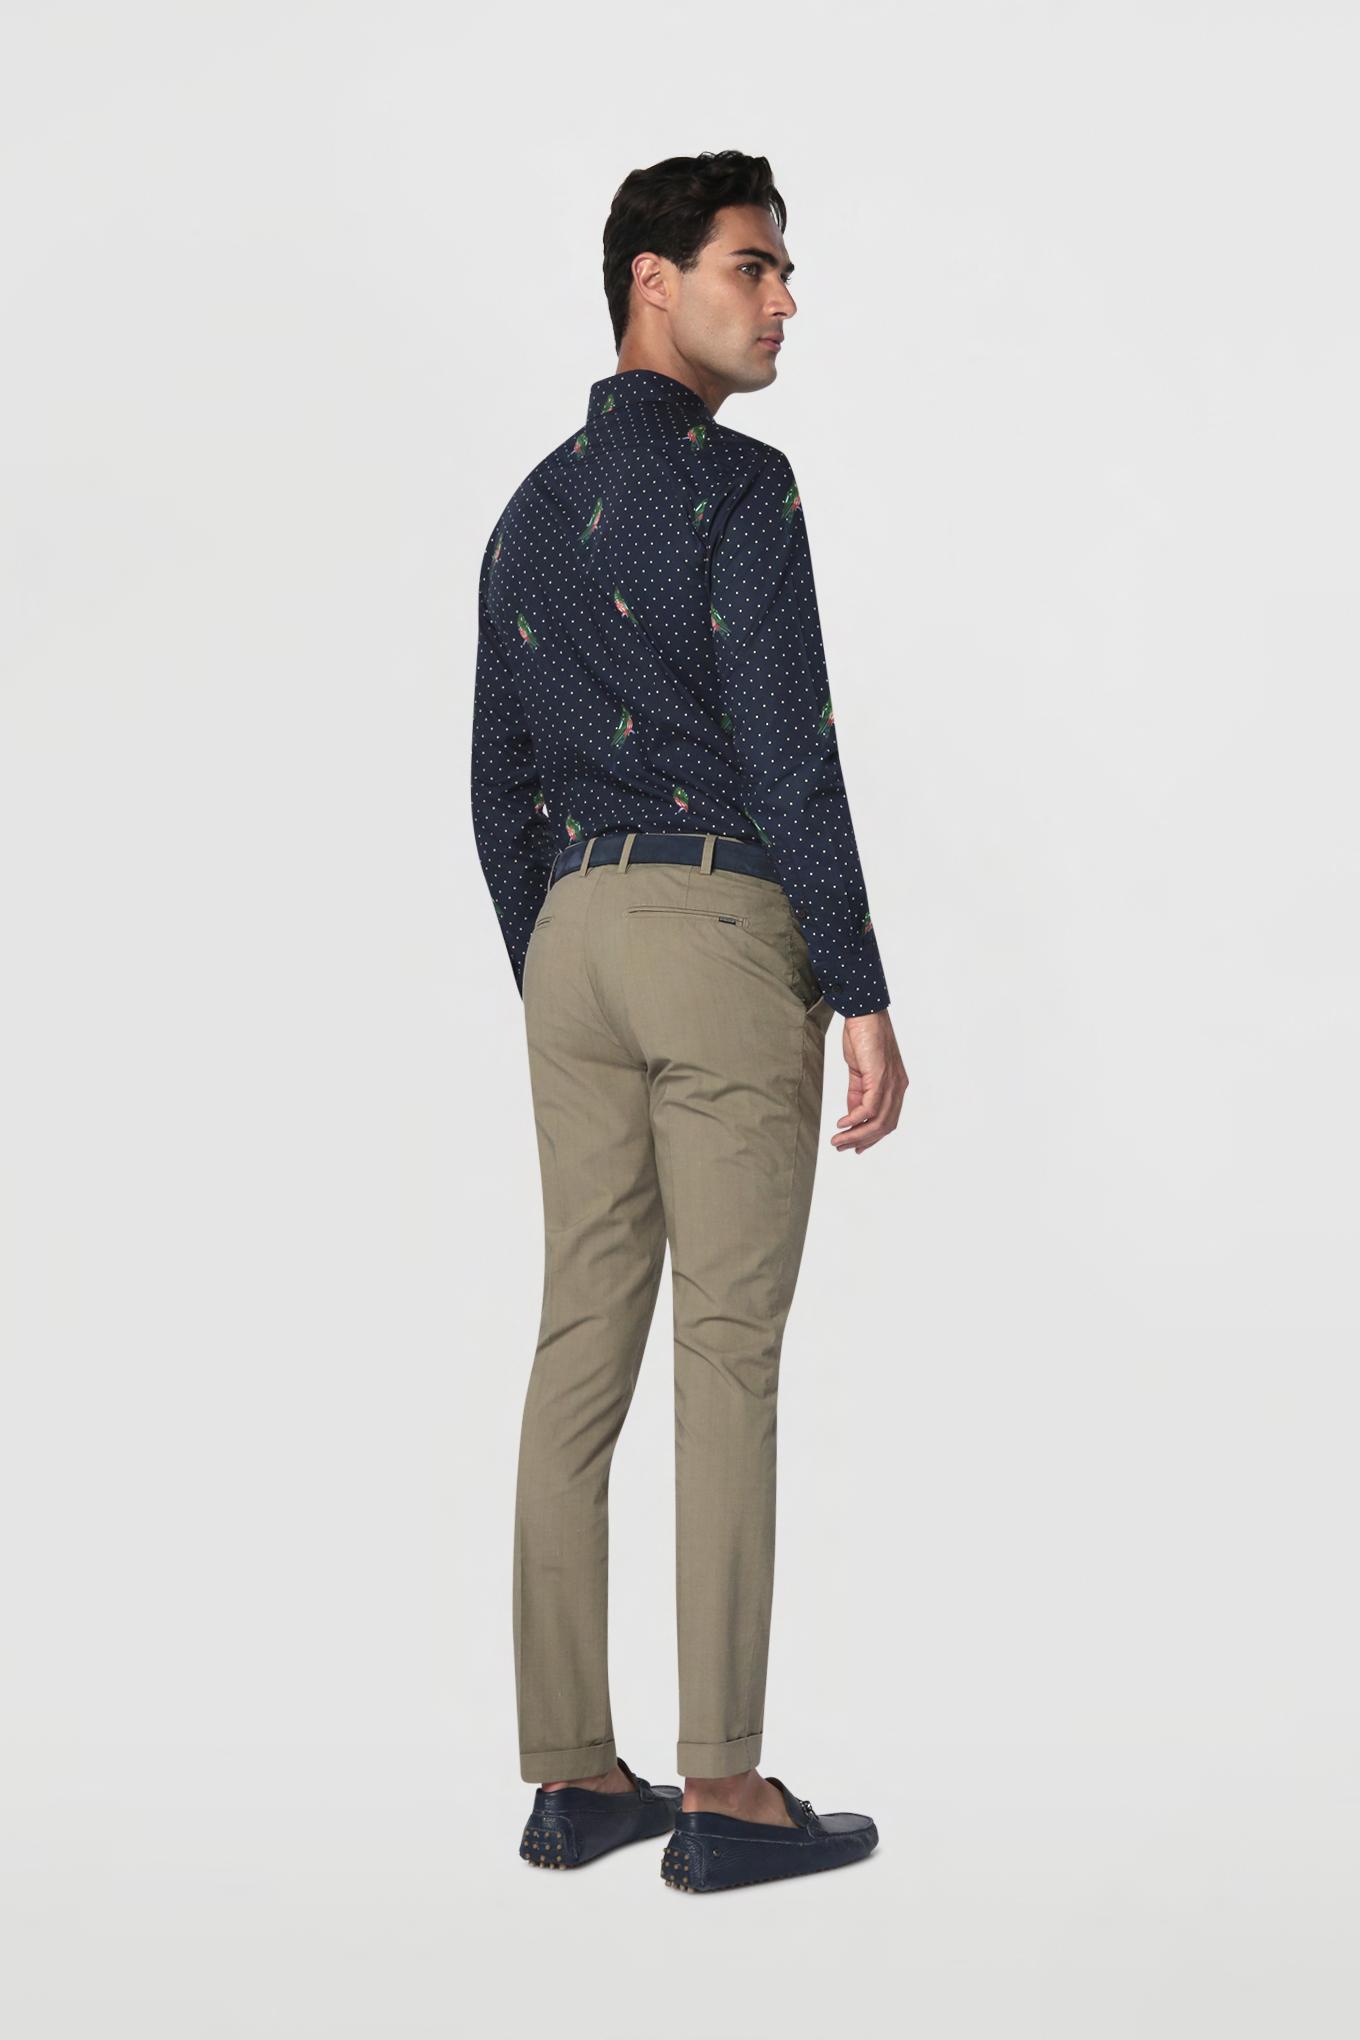 Chino Trousers Khaki Casual Man